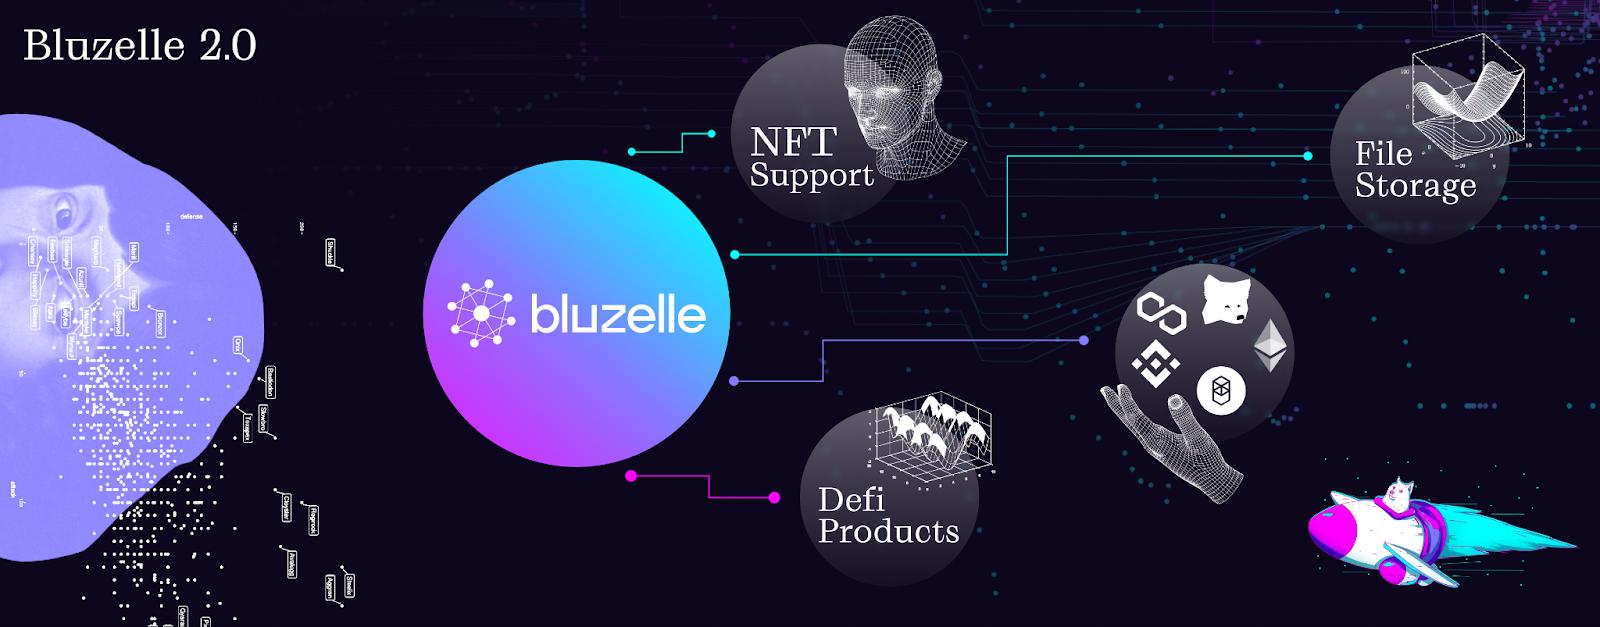 Bluzelle Announces Major Rebrand, Decentralized File Storage, and DeFi Expansion